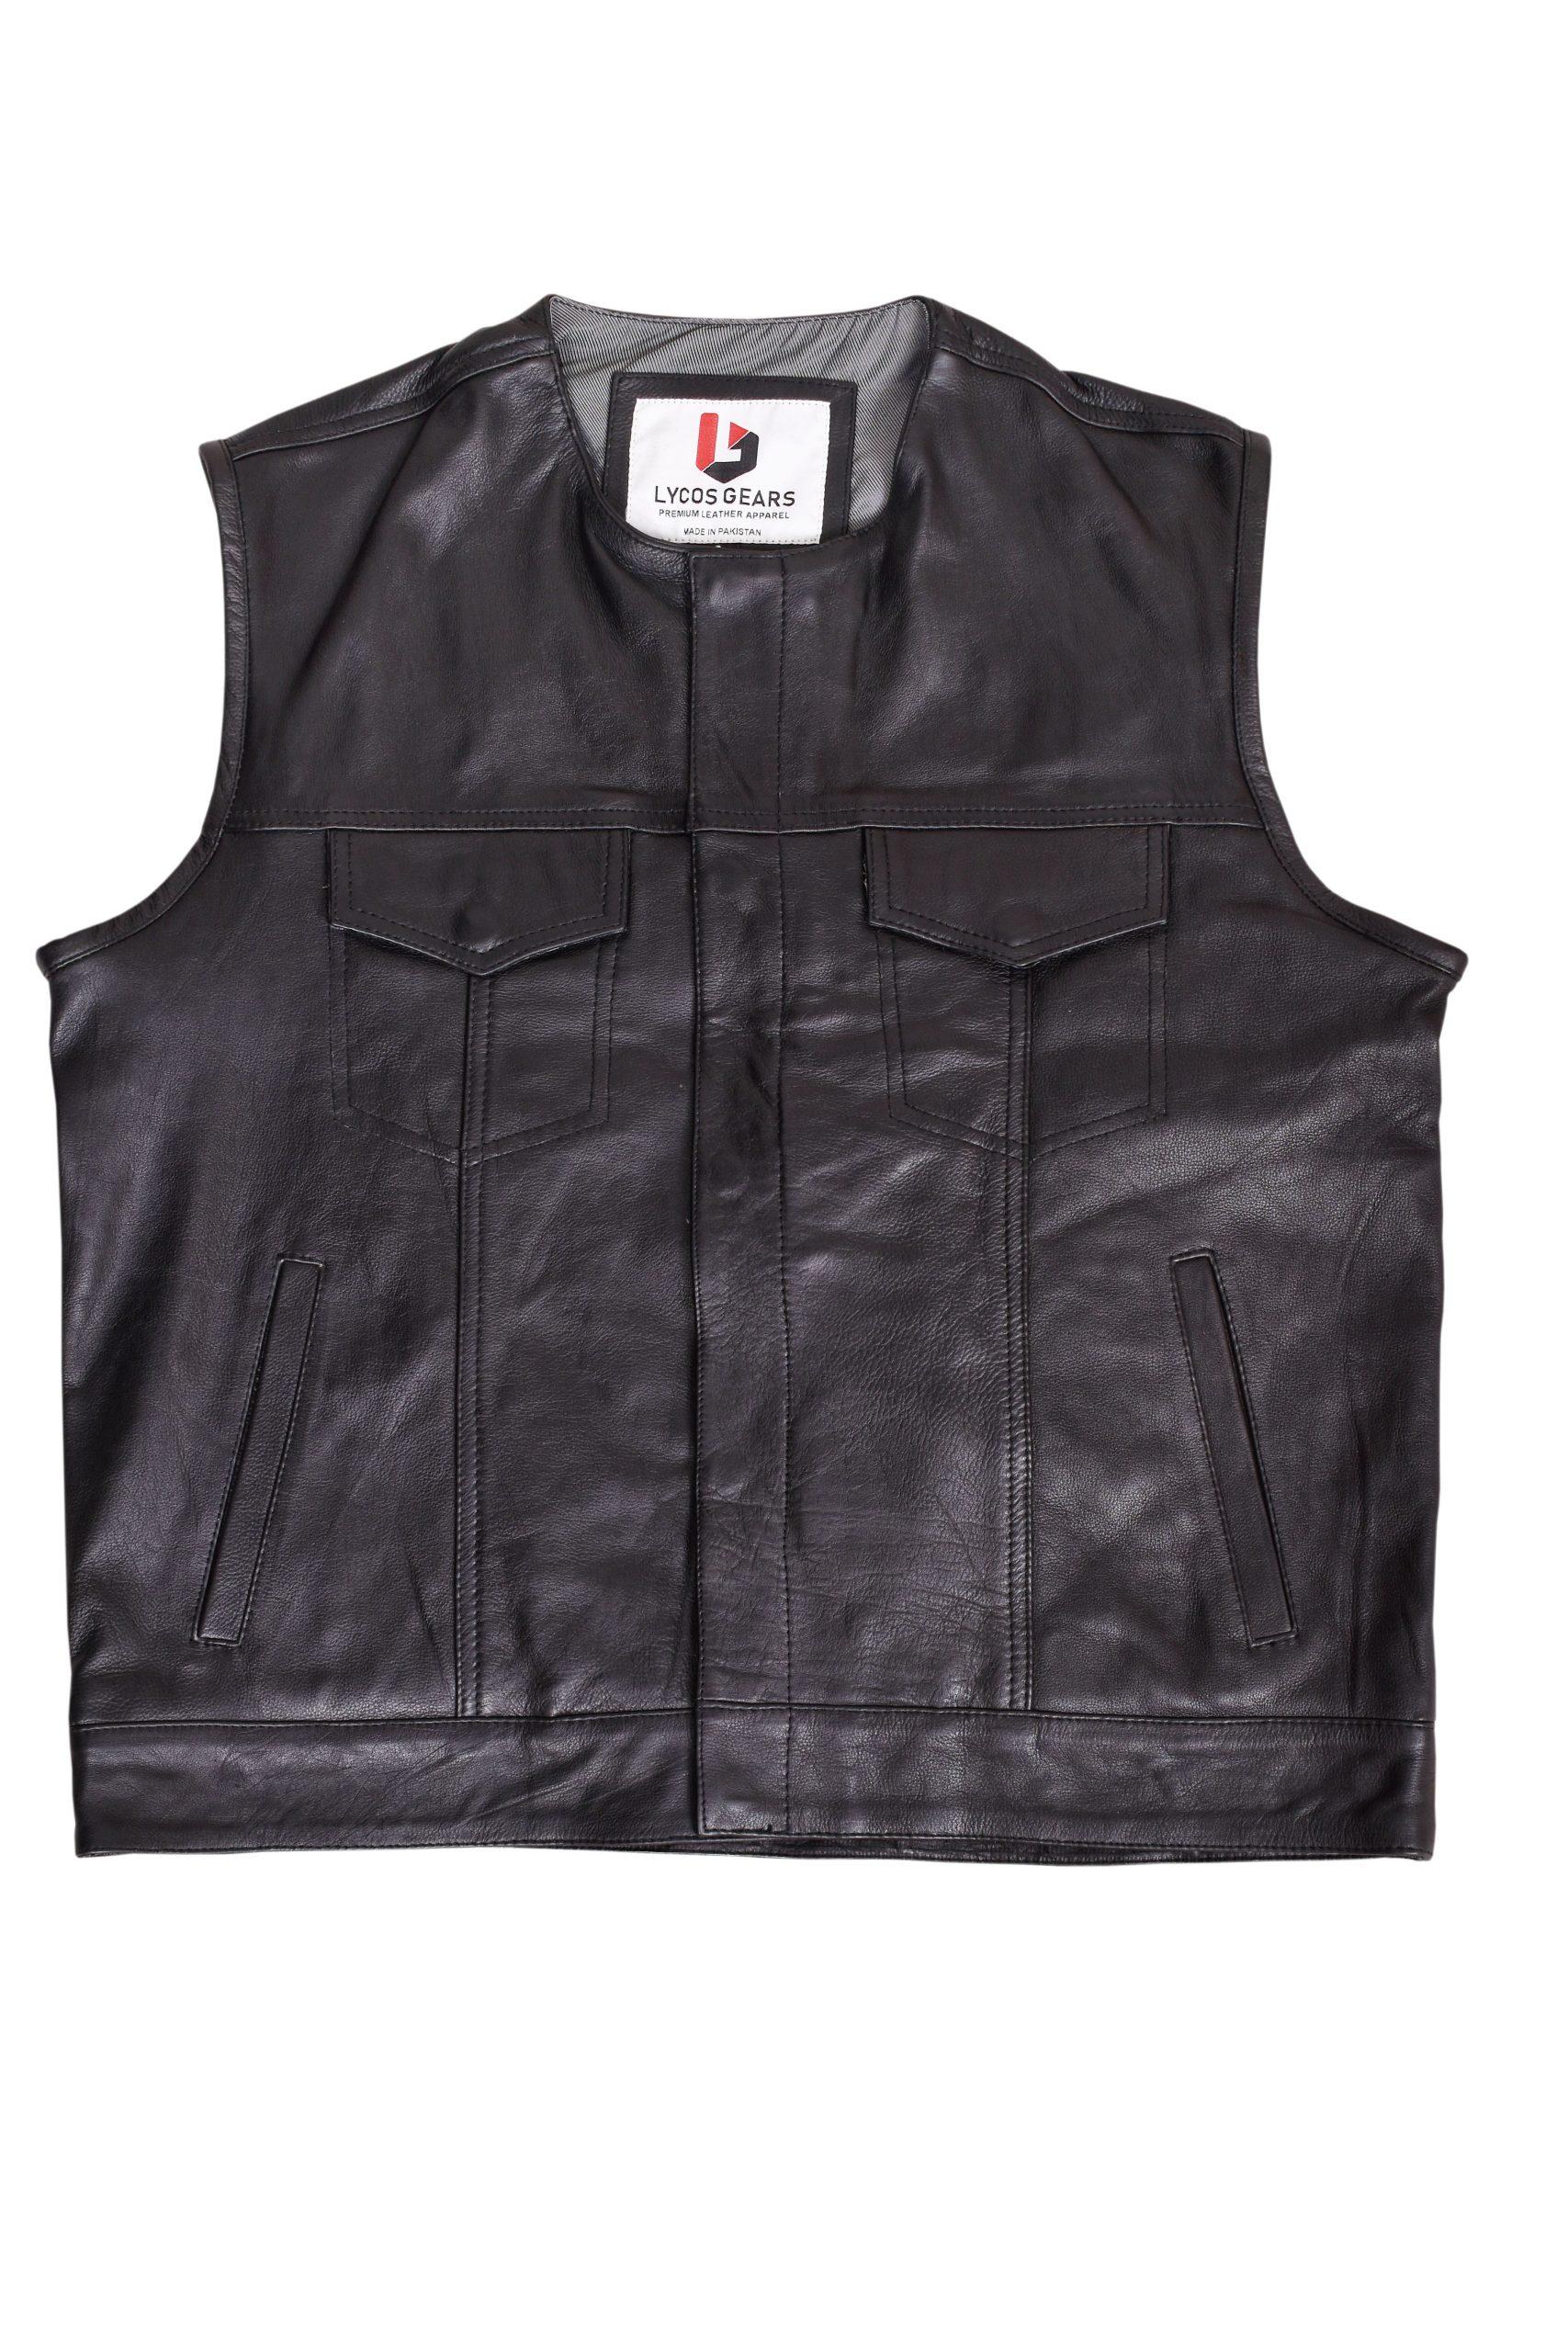 Leather Vest with Gun Pocket